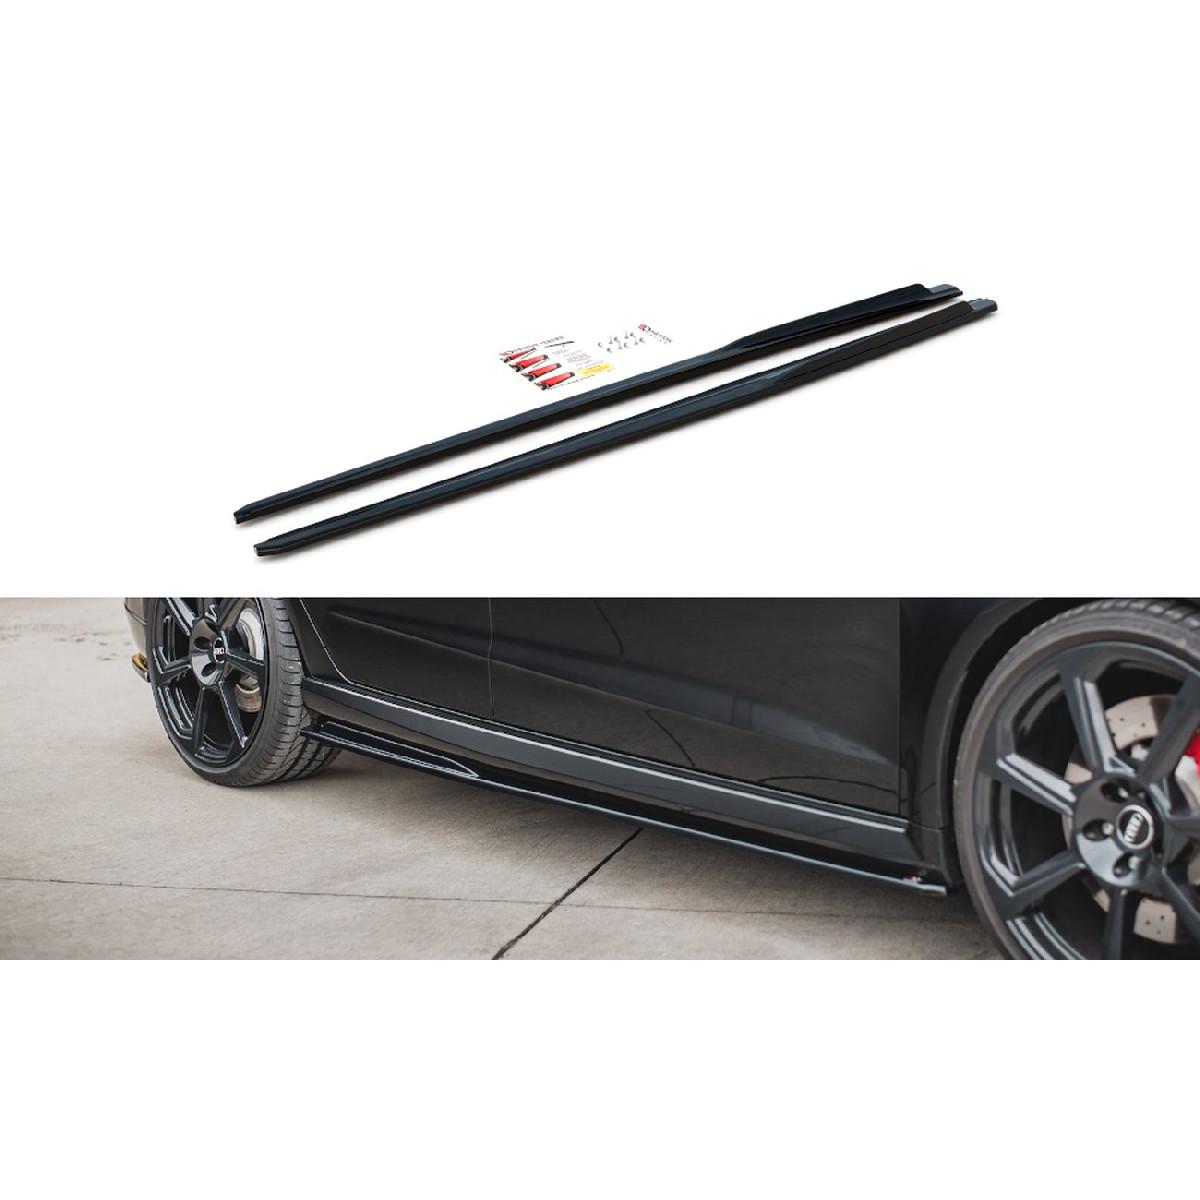 Seitenschweller Ansatz Cup Leisten V.2 für Audi RS3 8V Sportback Facelift schwarz matt